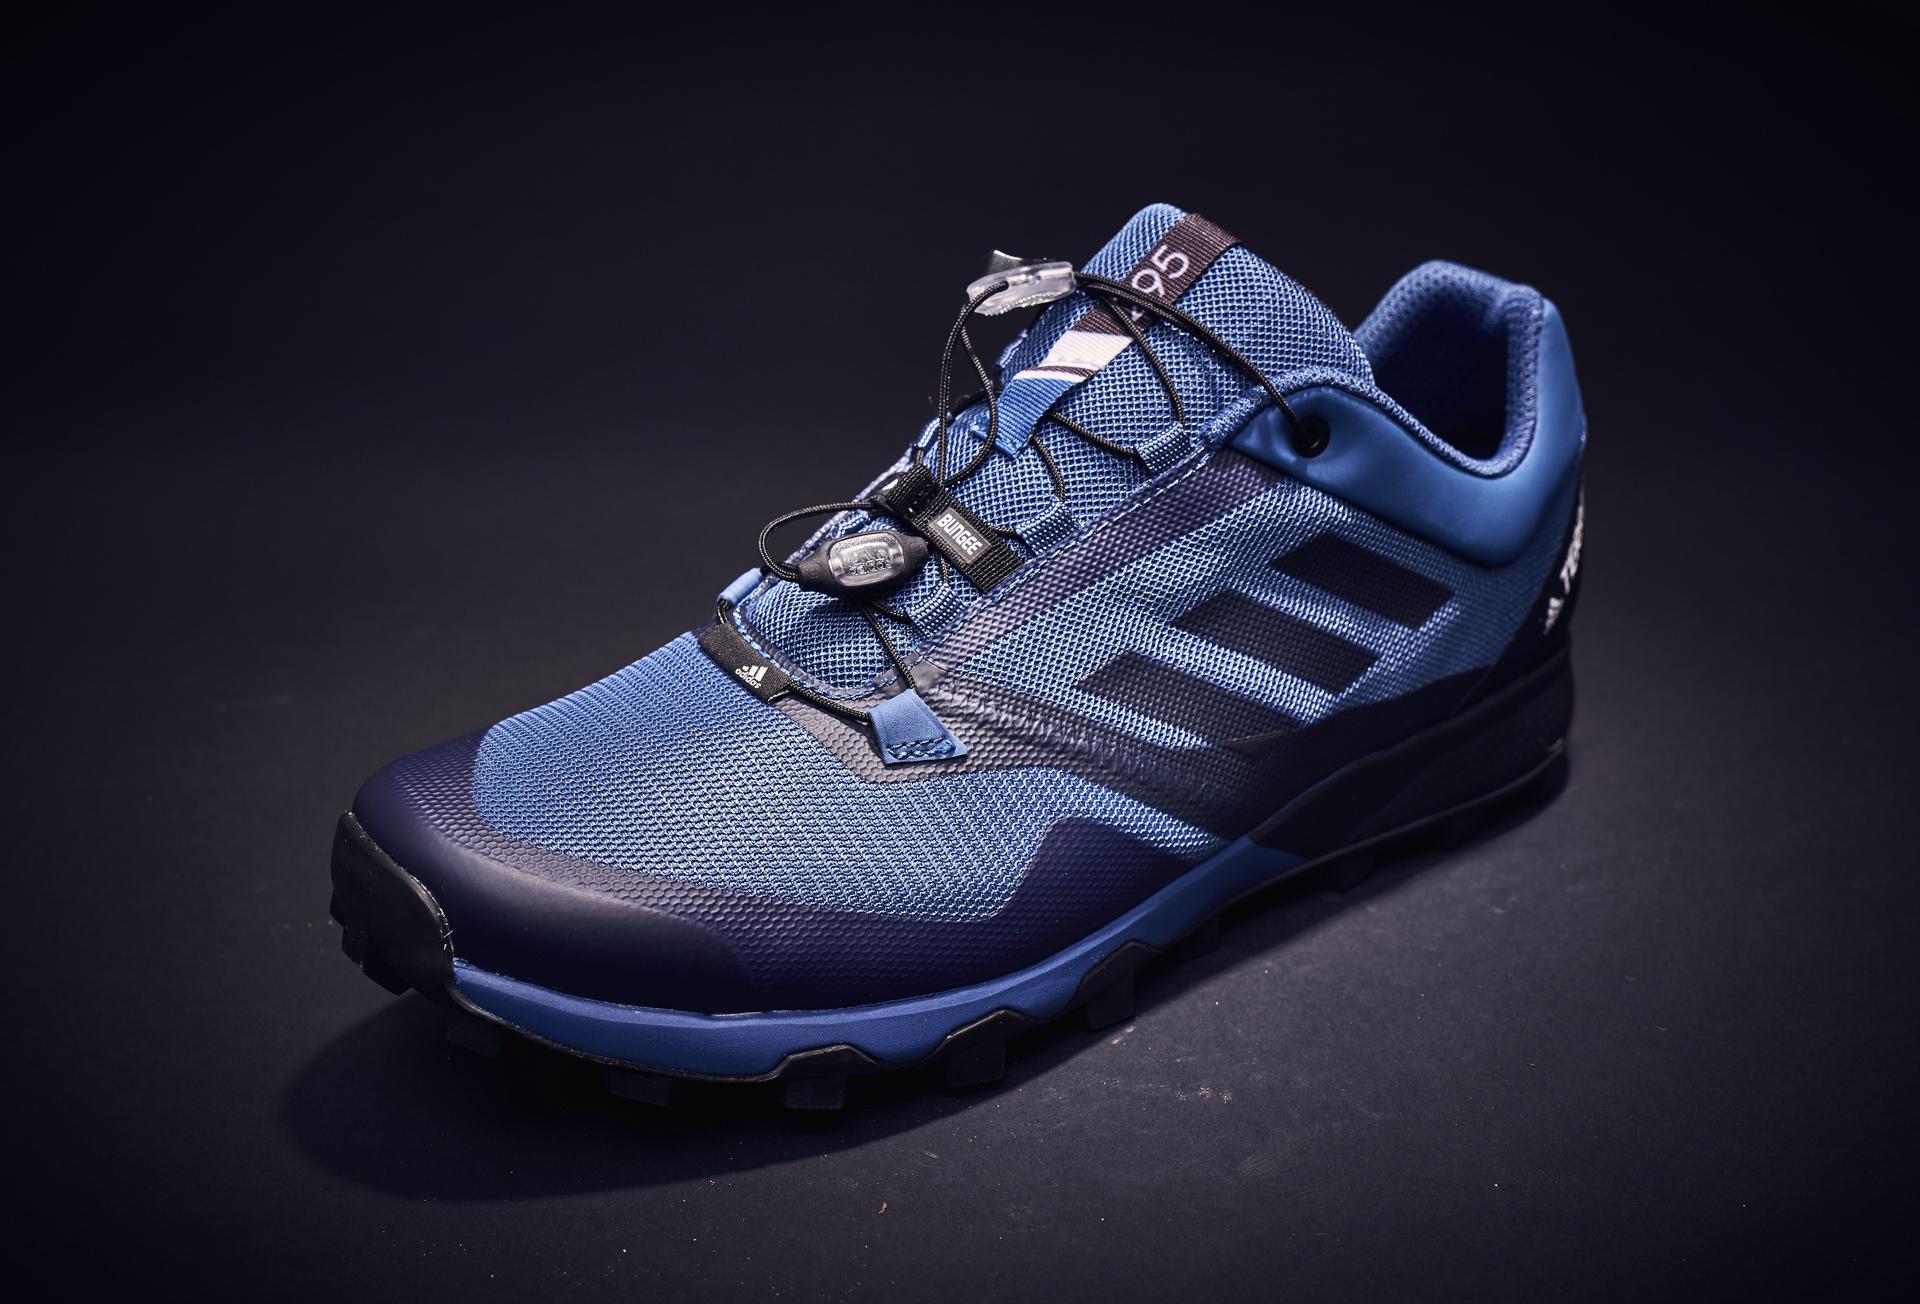 Adidas Terrex Trailmaker - xc-run.de Trailrunning